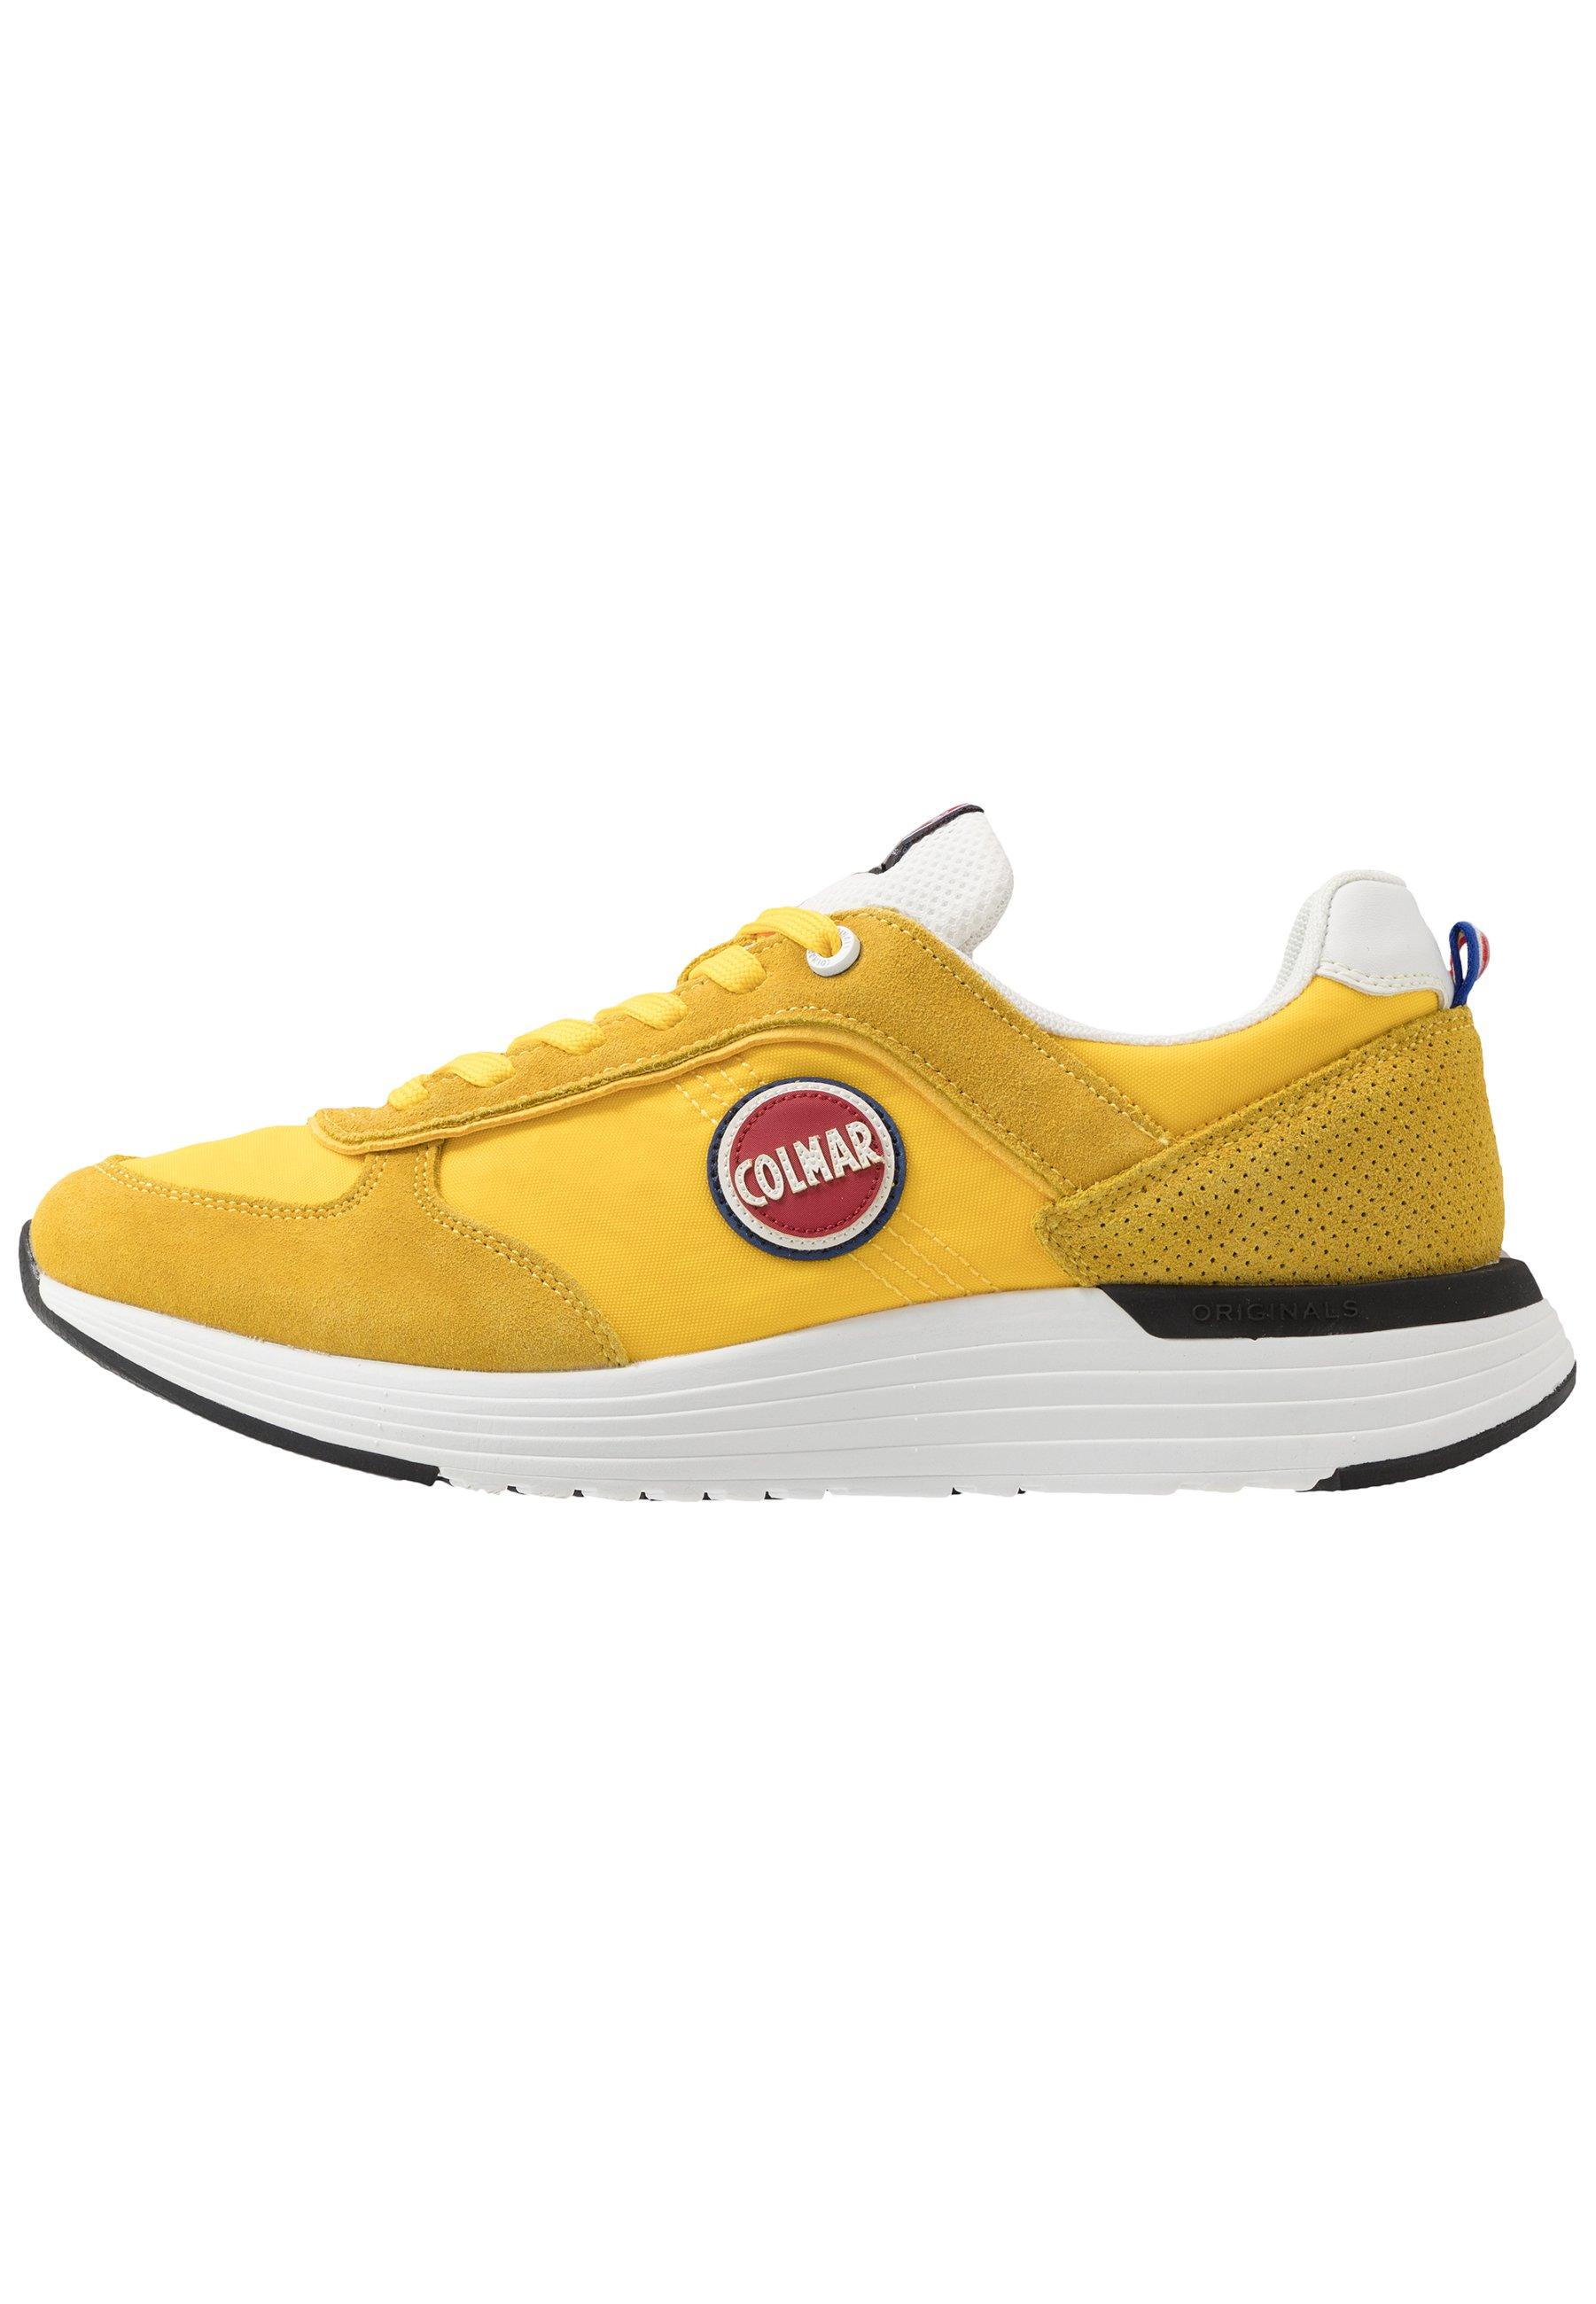 TRAVIS X 1 BOLD Sneaker low yellow